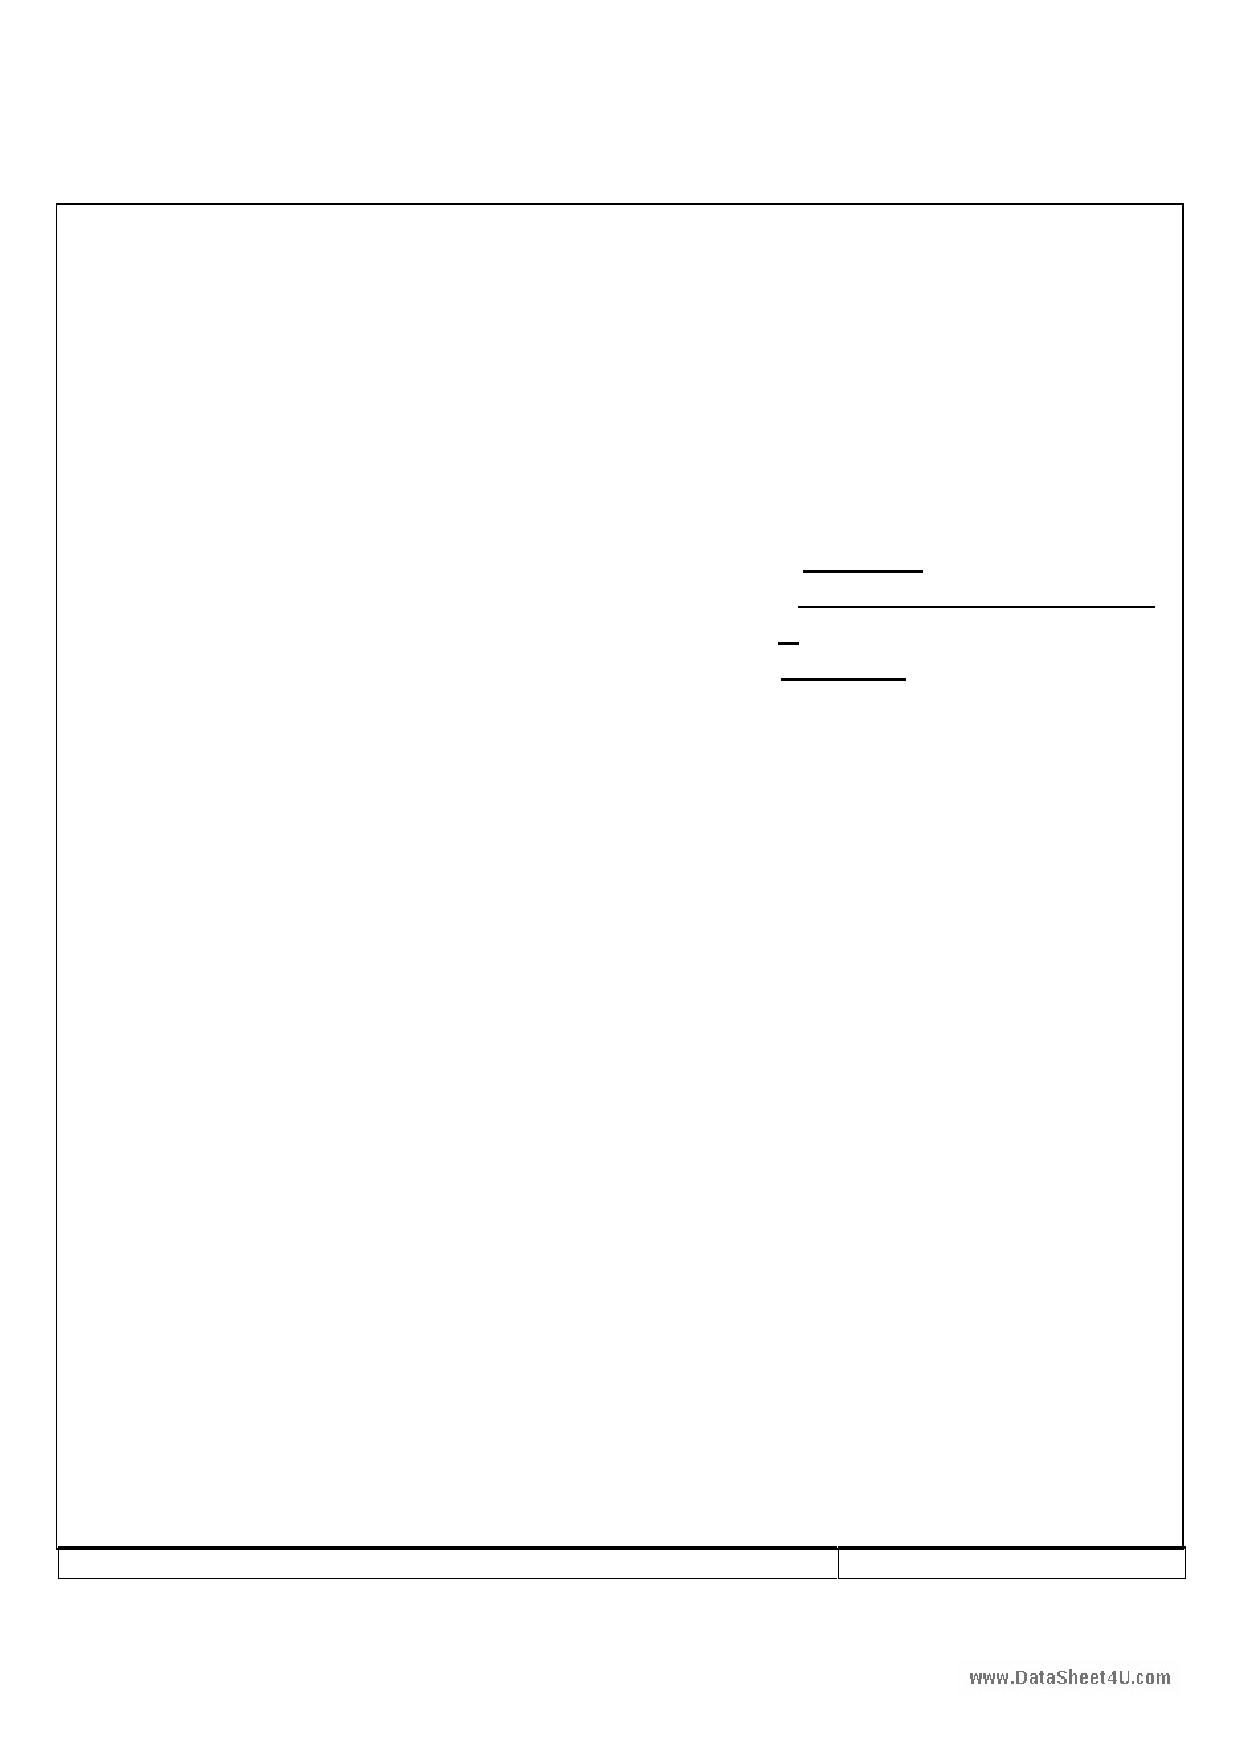 ND39R1 دیتاشیت PDF